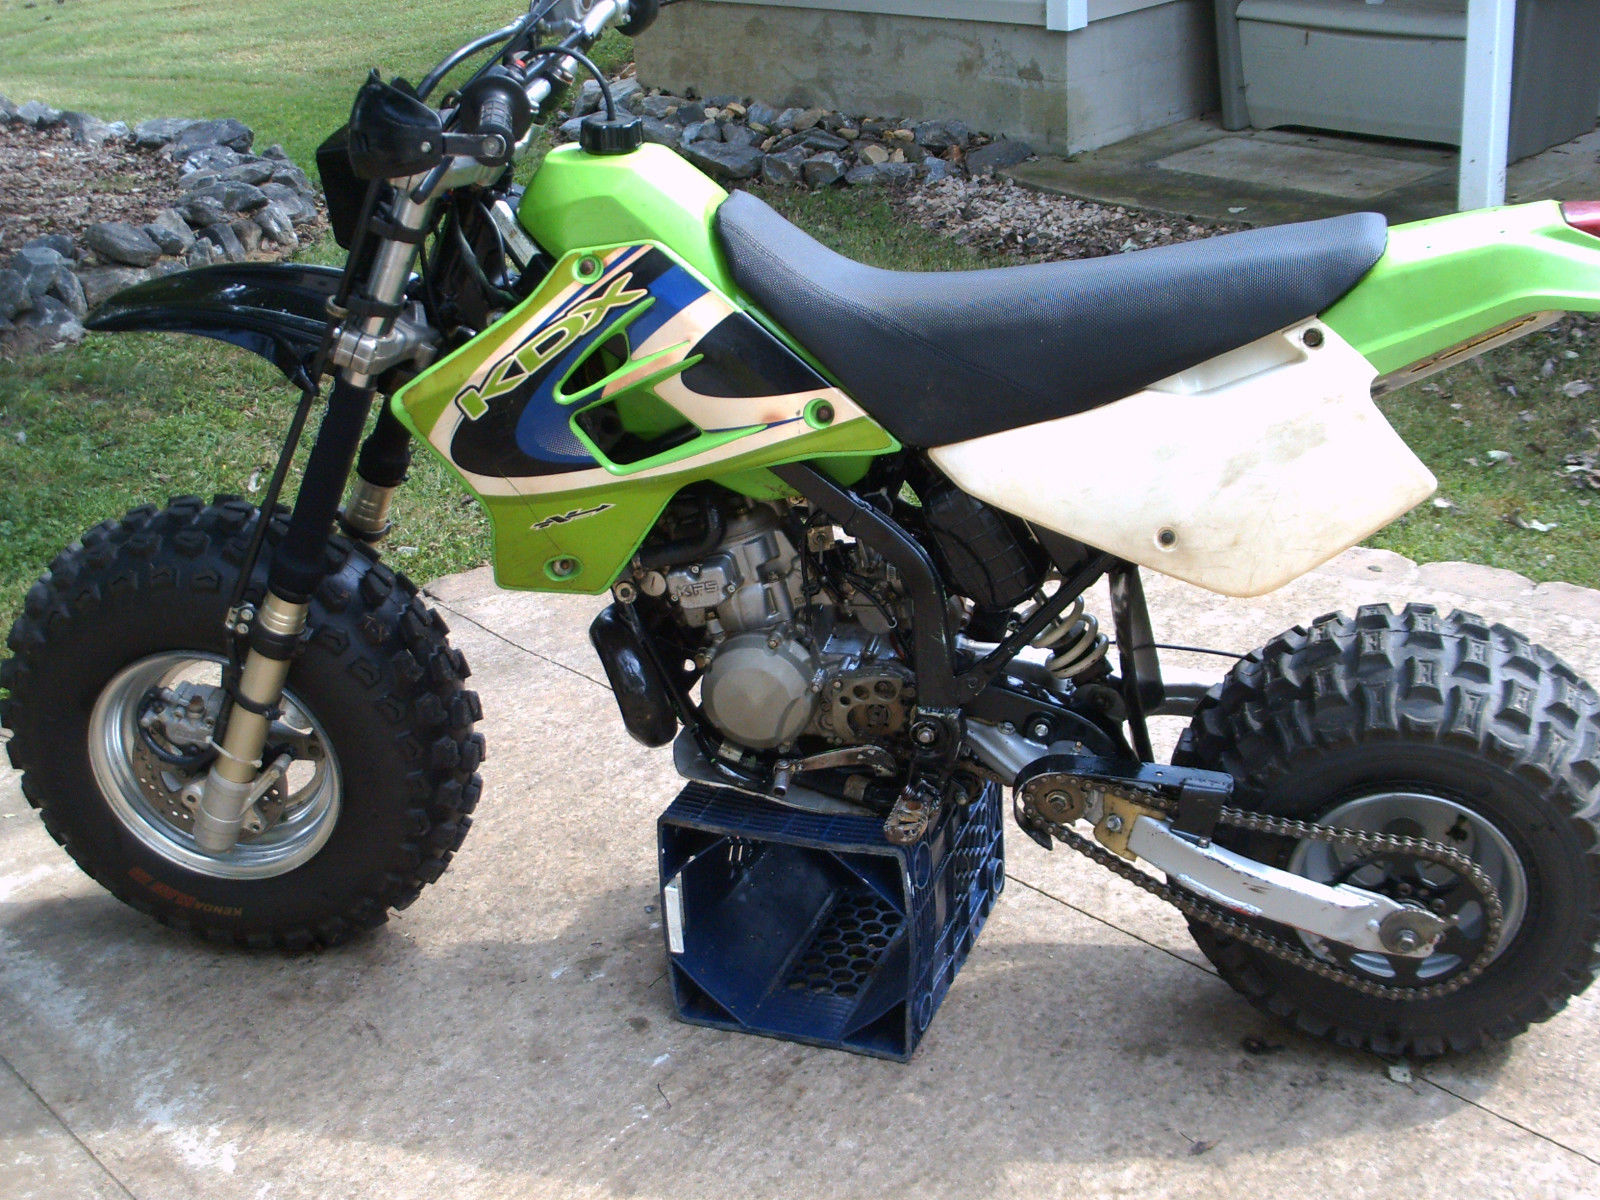 Kawasaki Yamaha Big Wheel Bw Type Kdx 200 Conversion Custom Atc Missile